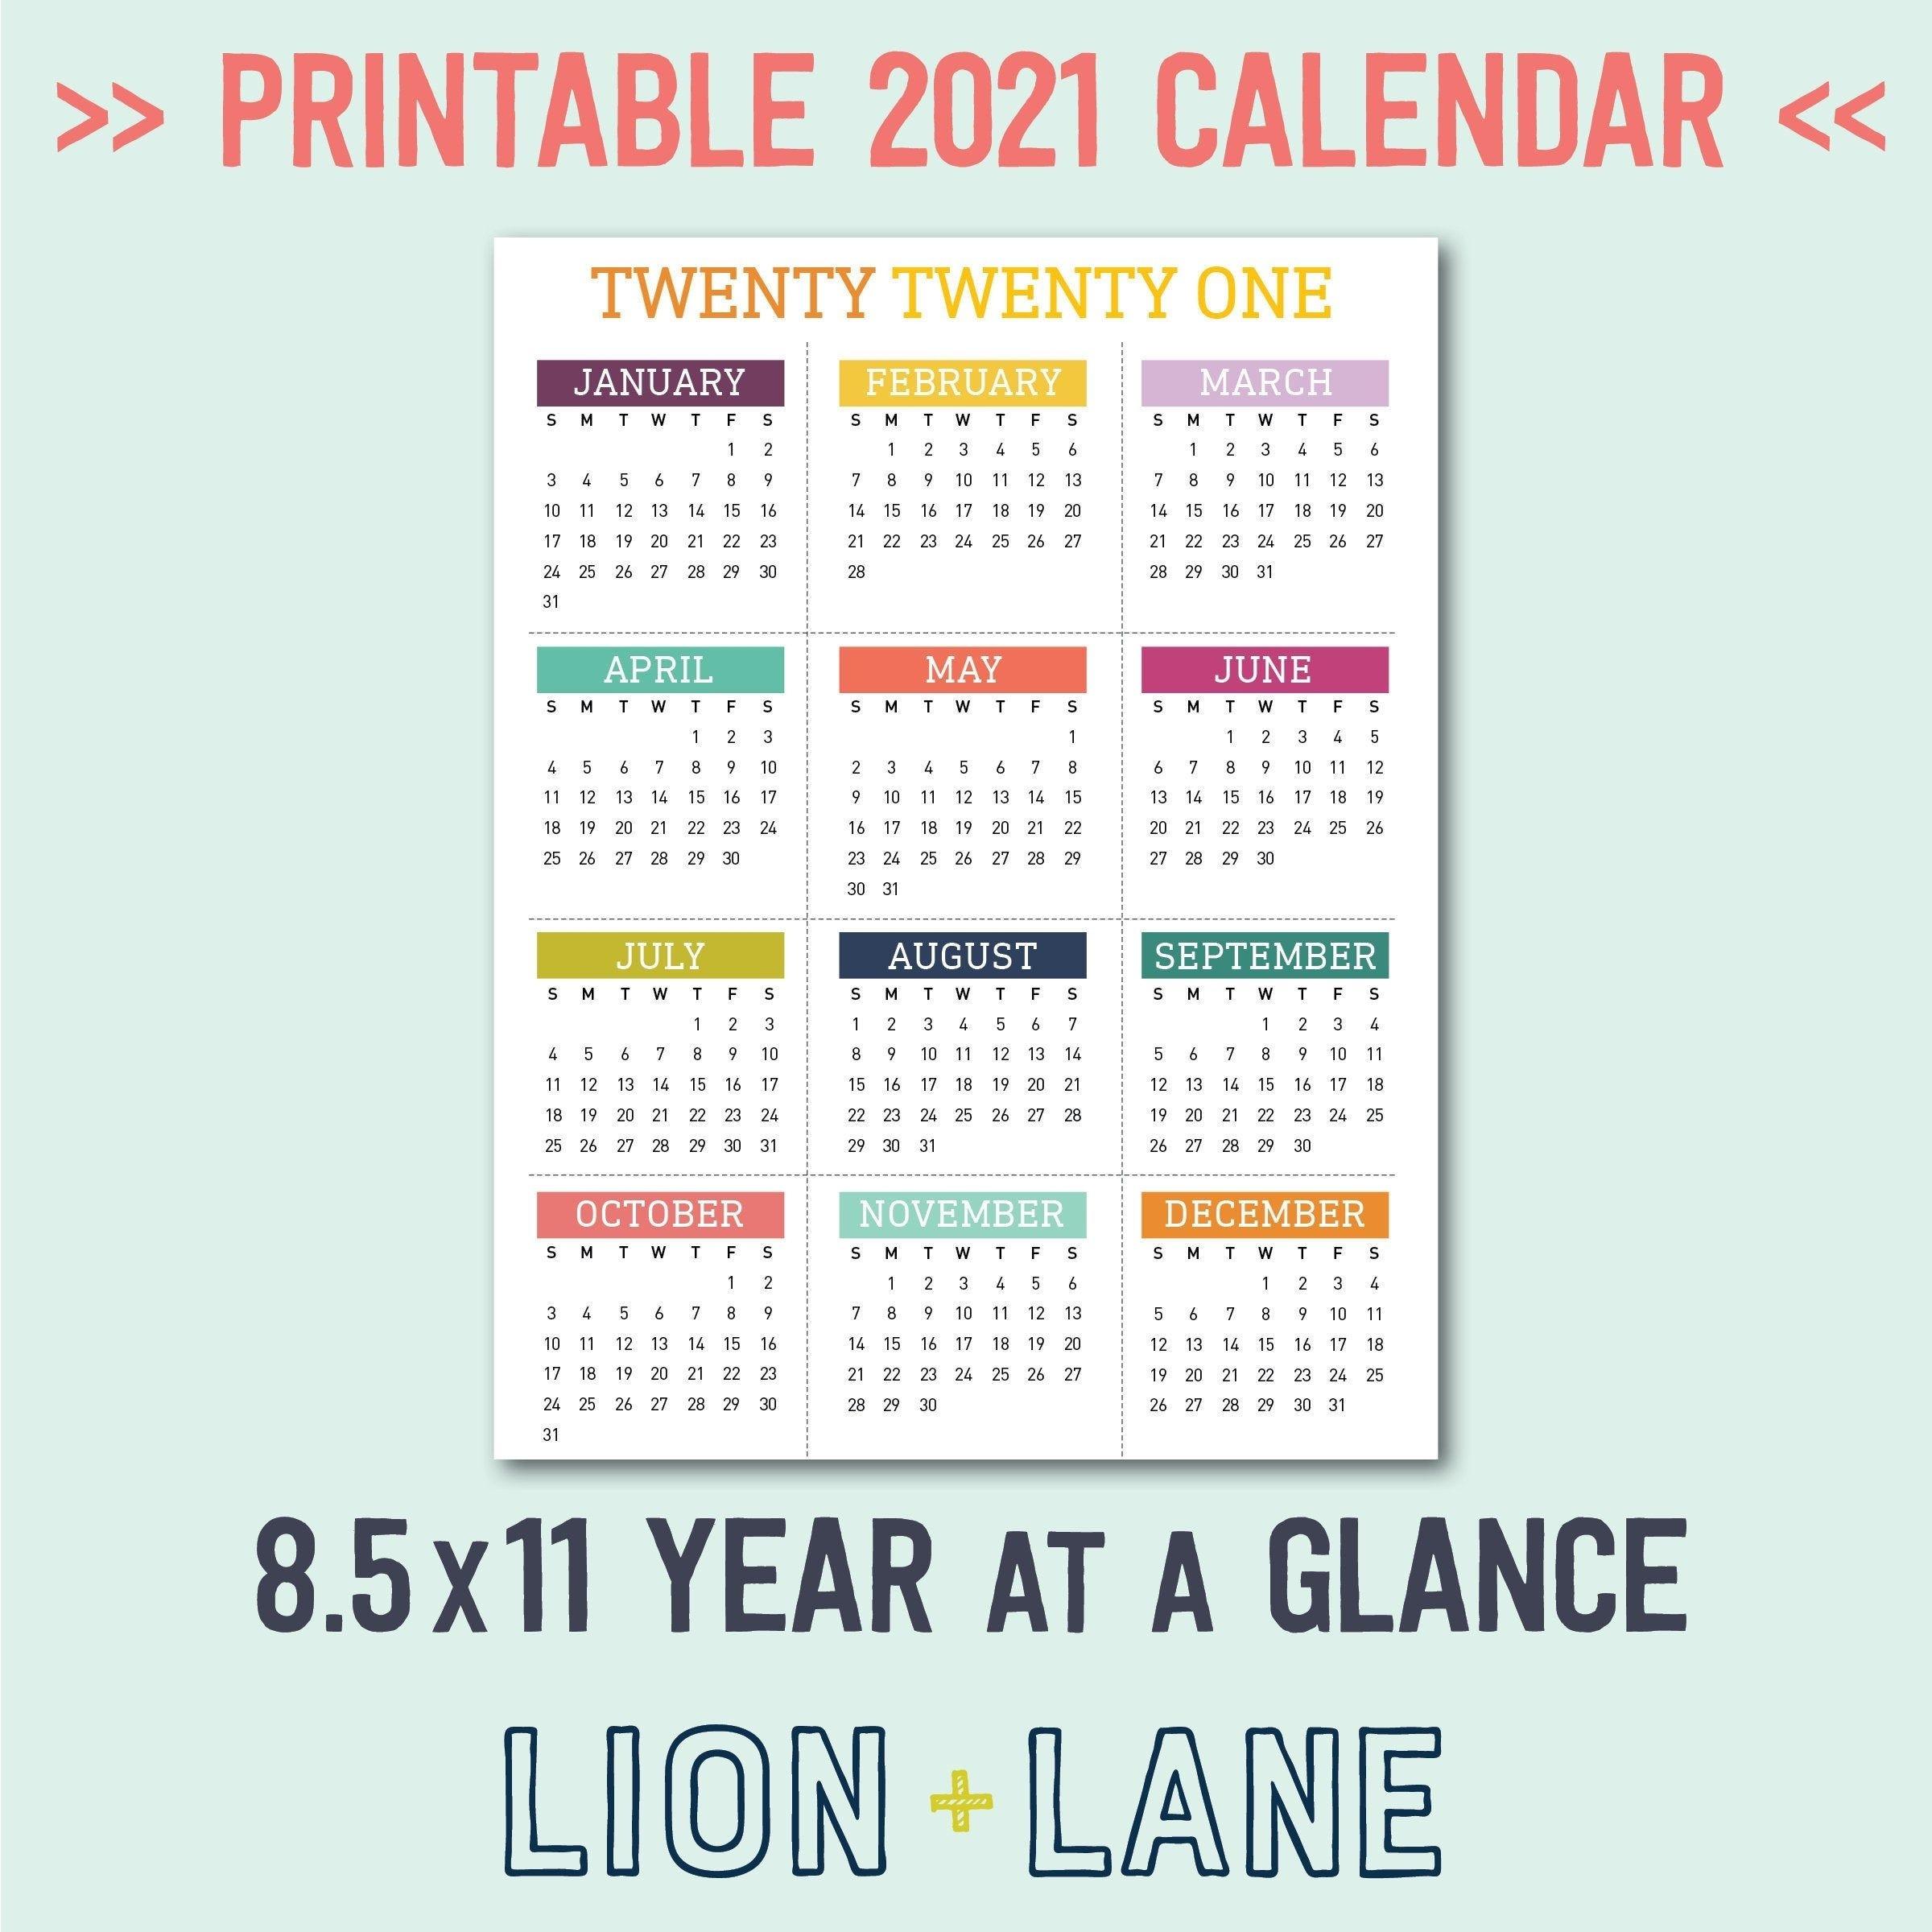 Free National Day Calendar 2021 - Calendar Inspiration Design-Printable List Of 2021 National Days